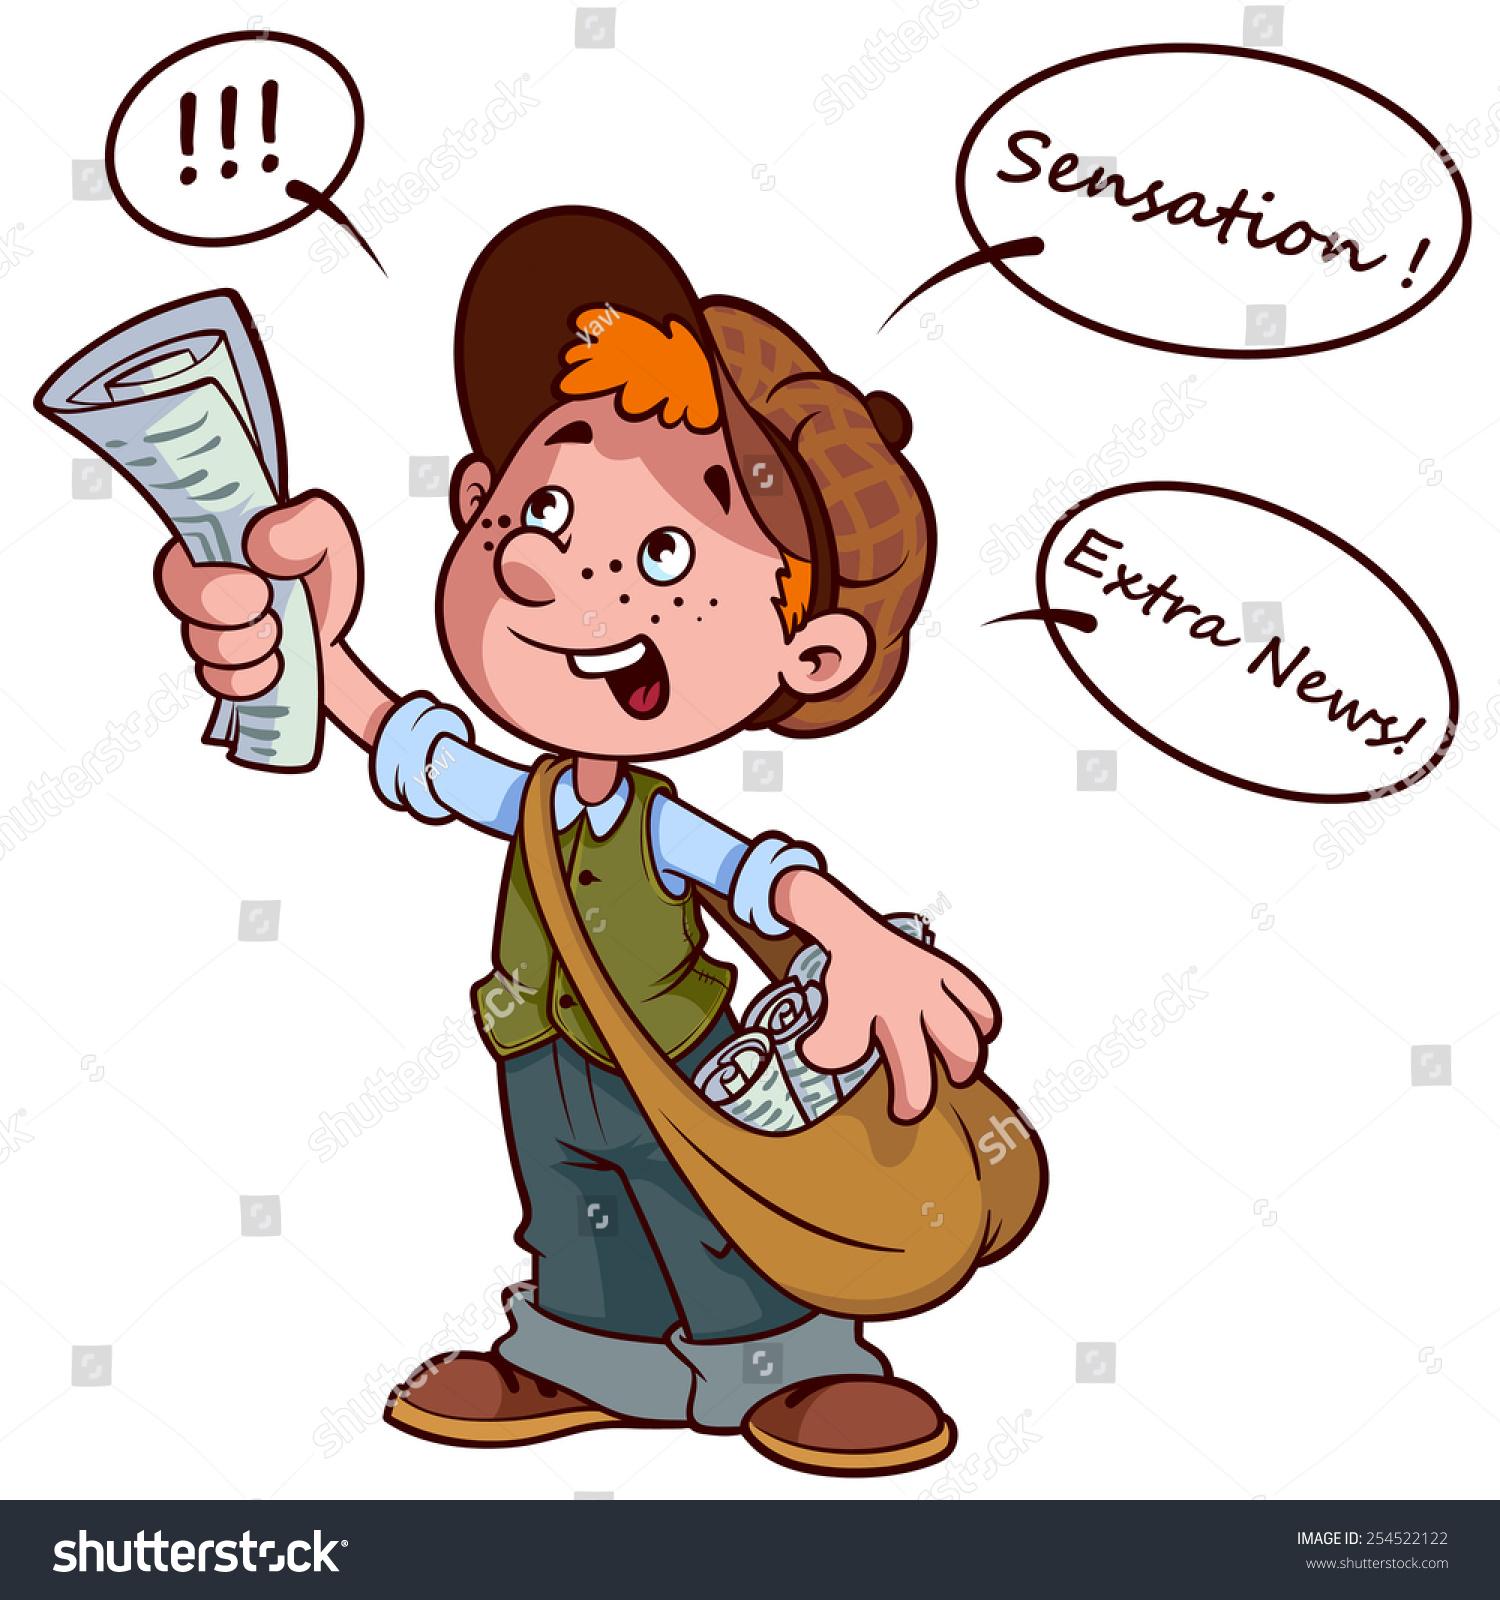 cartoon paper boy yelling sensational news stock vector (royalty